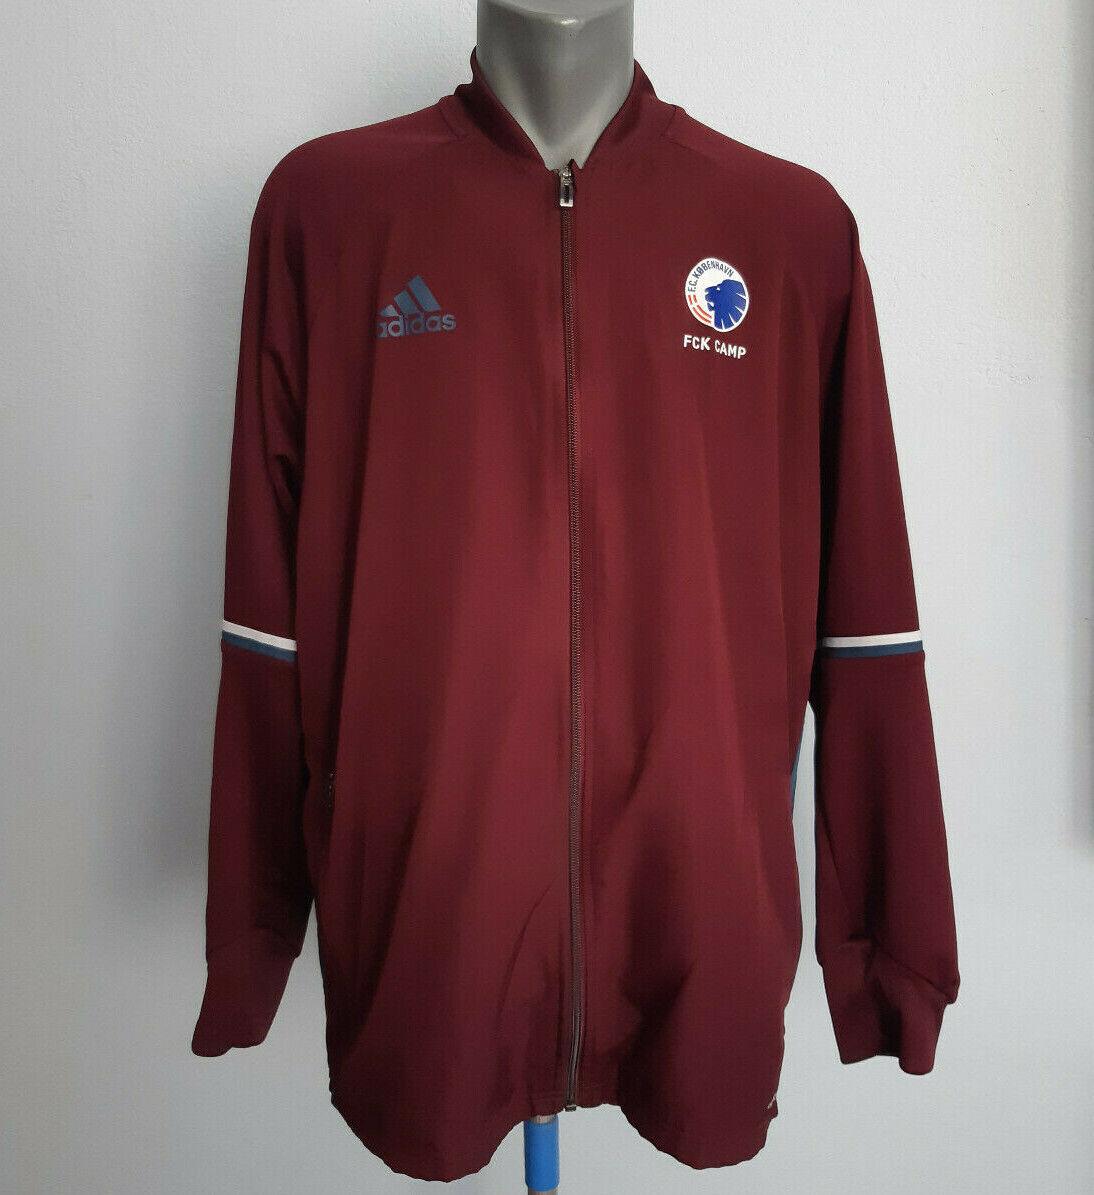 FC Copenhagen Training Jacket Adidas Full Zip Burgundy Red Size XL Track Suit